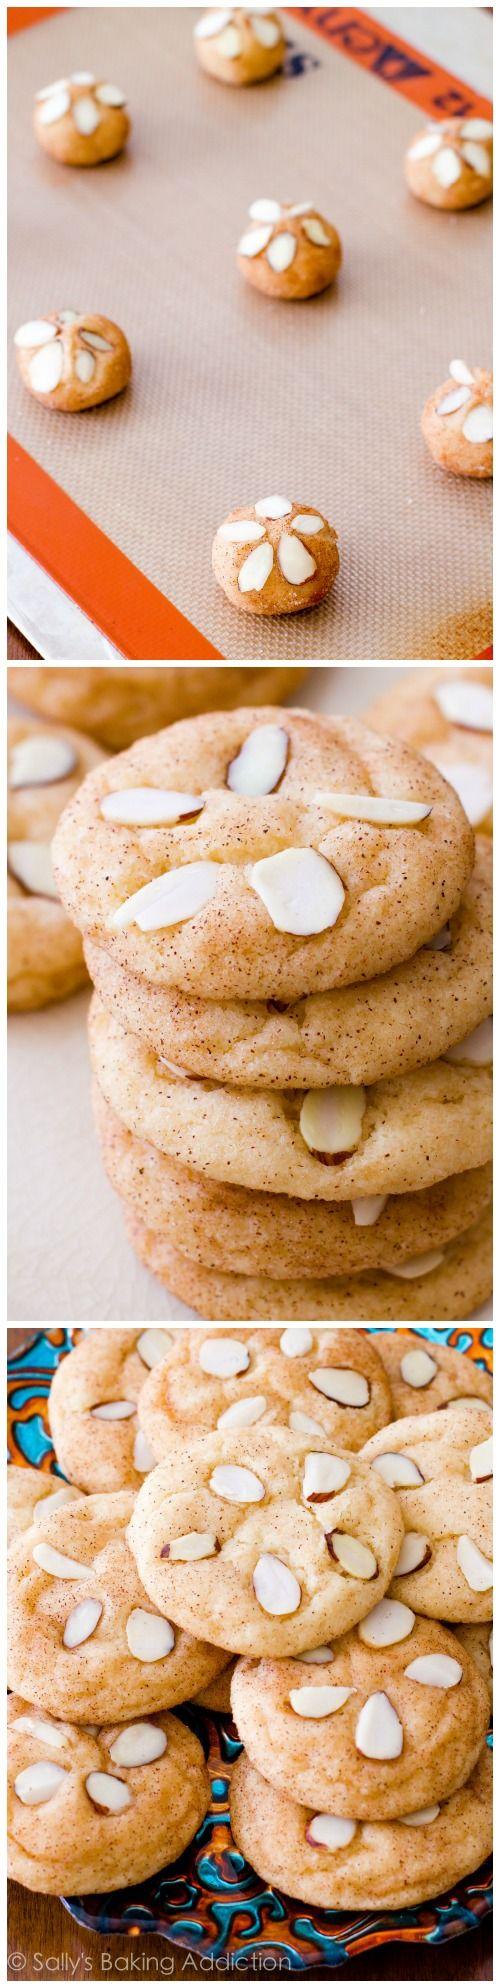 Delicious Cinnamon Sugar Sand Dollar Cookies for the beach!